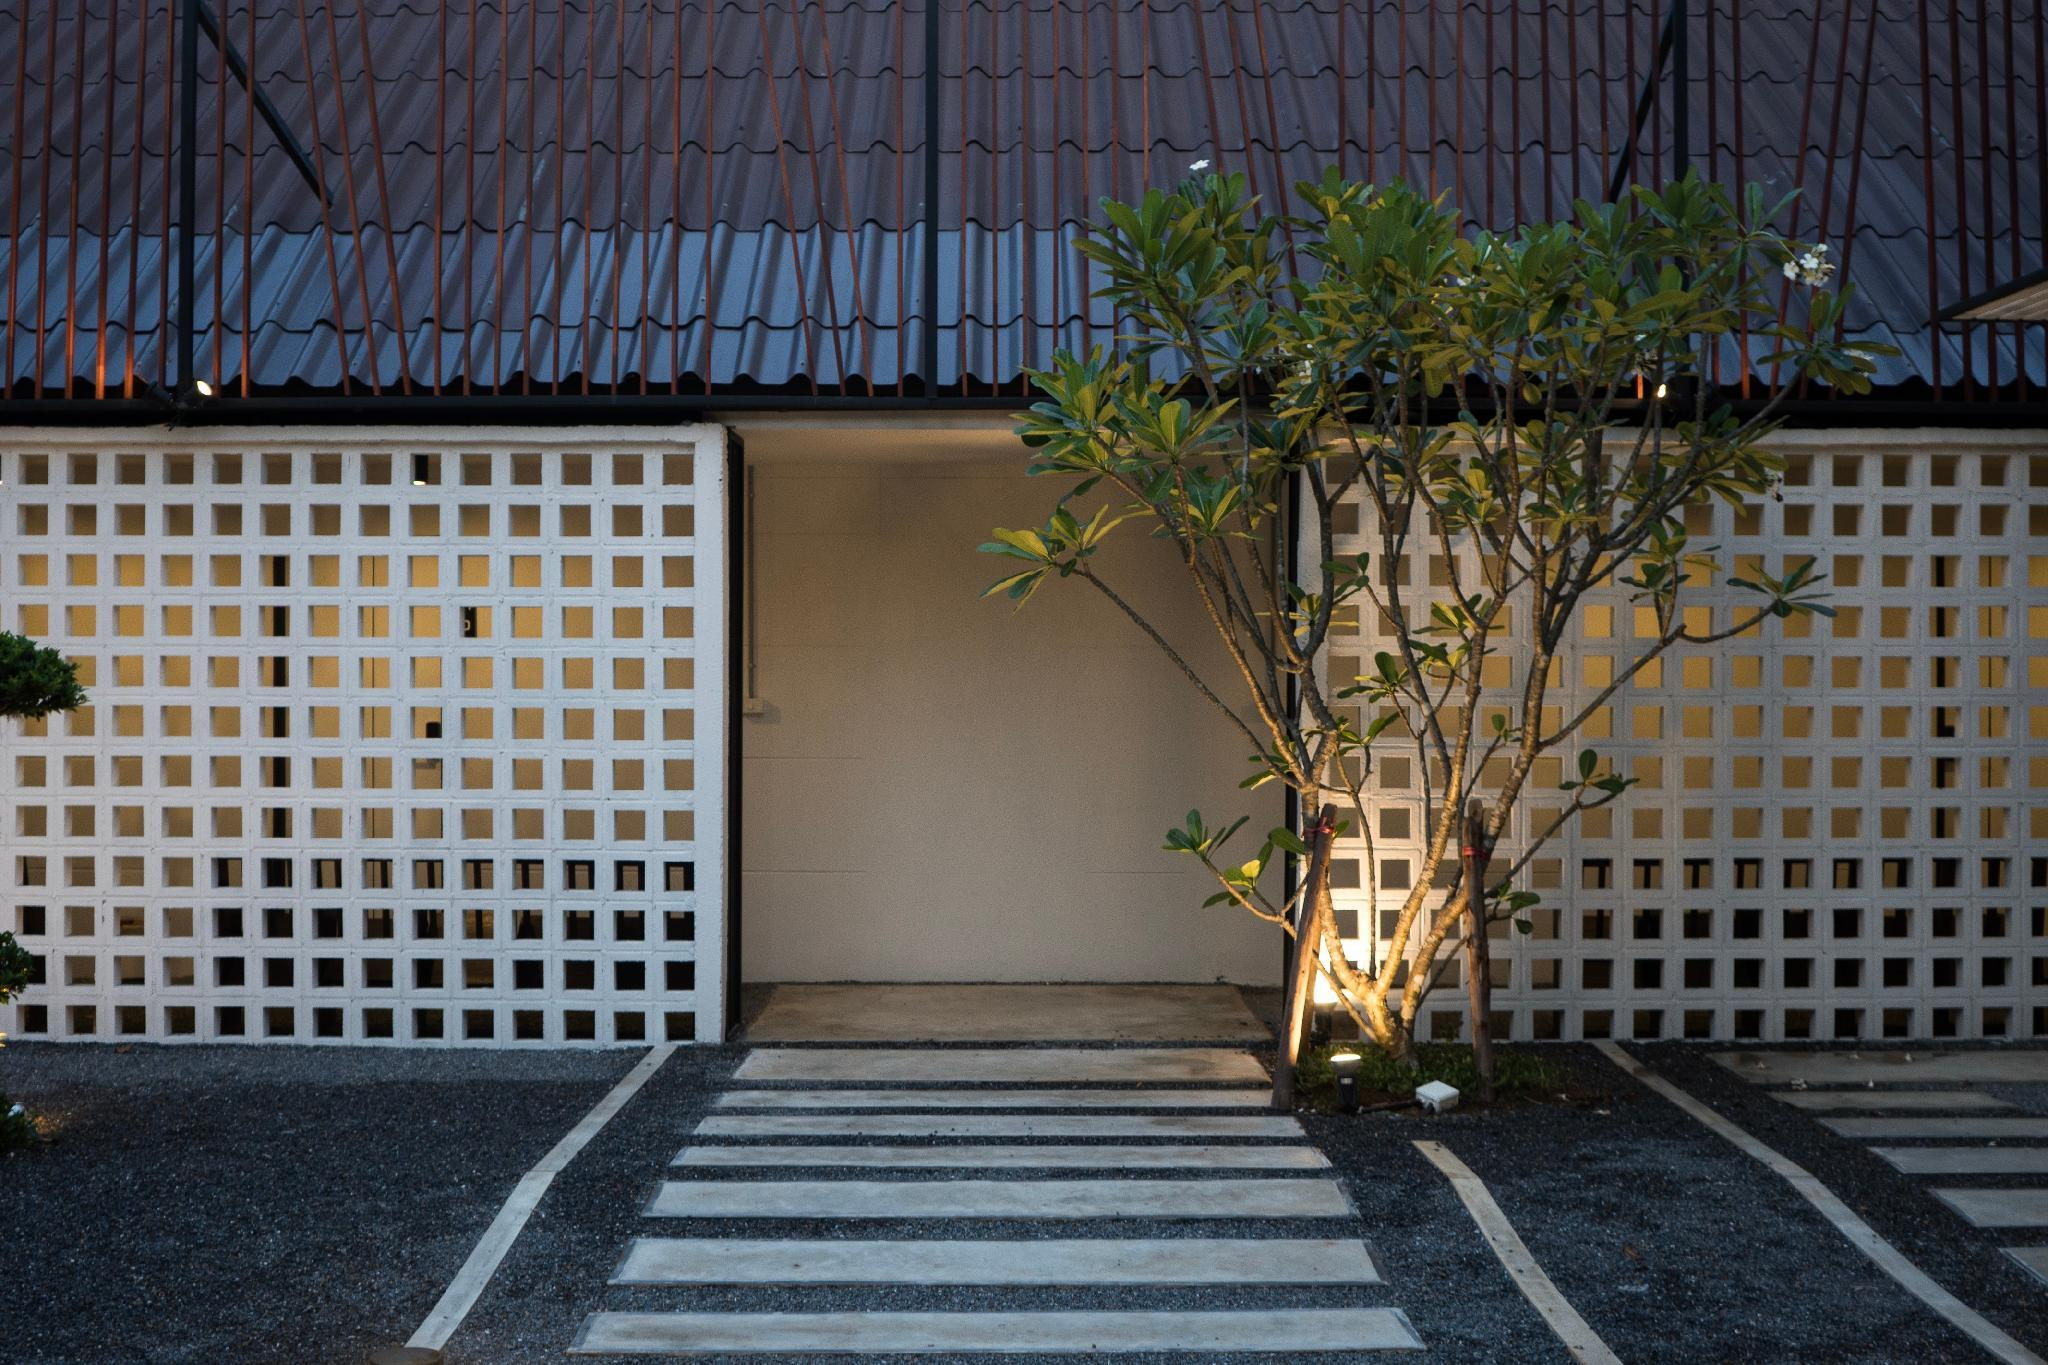 Zen Hostel Chiang Mai,Zen Hostel Chiang Mai